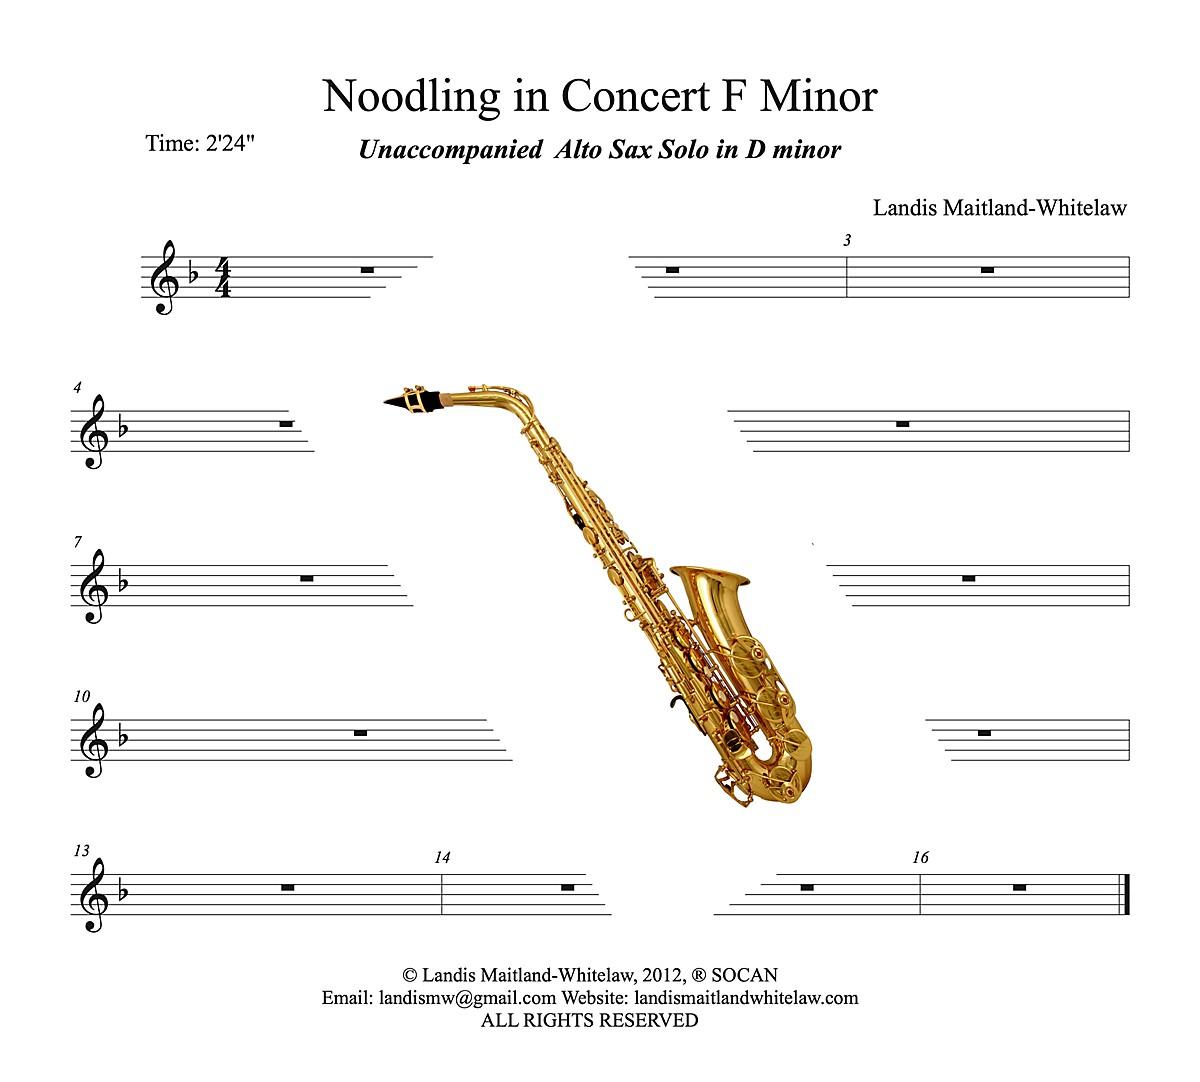 Noodling in Concert F minor-Landis Maitland-Whitelaw